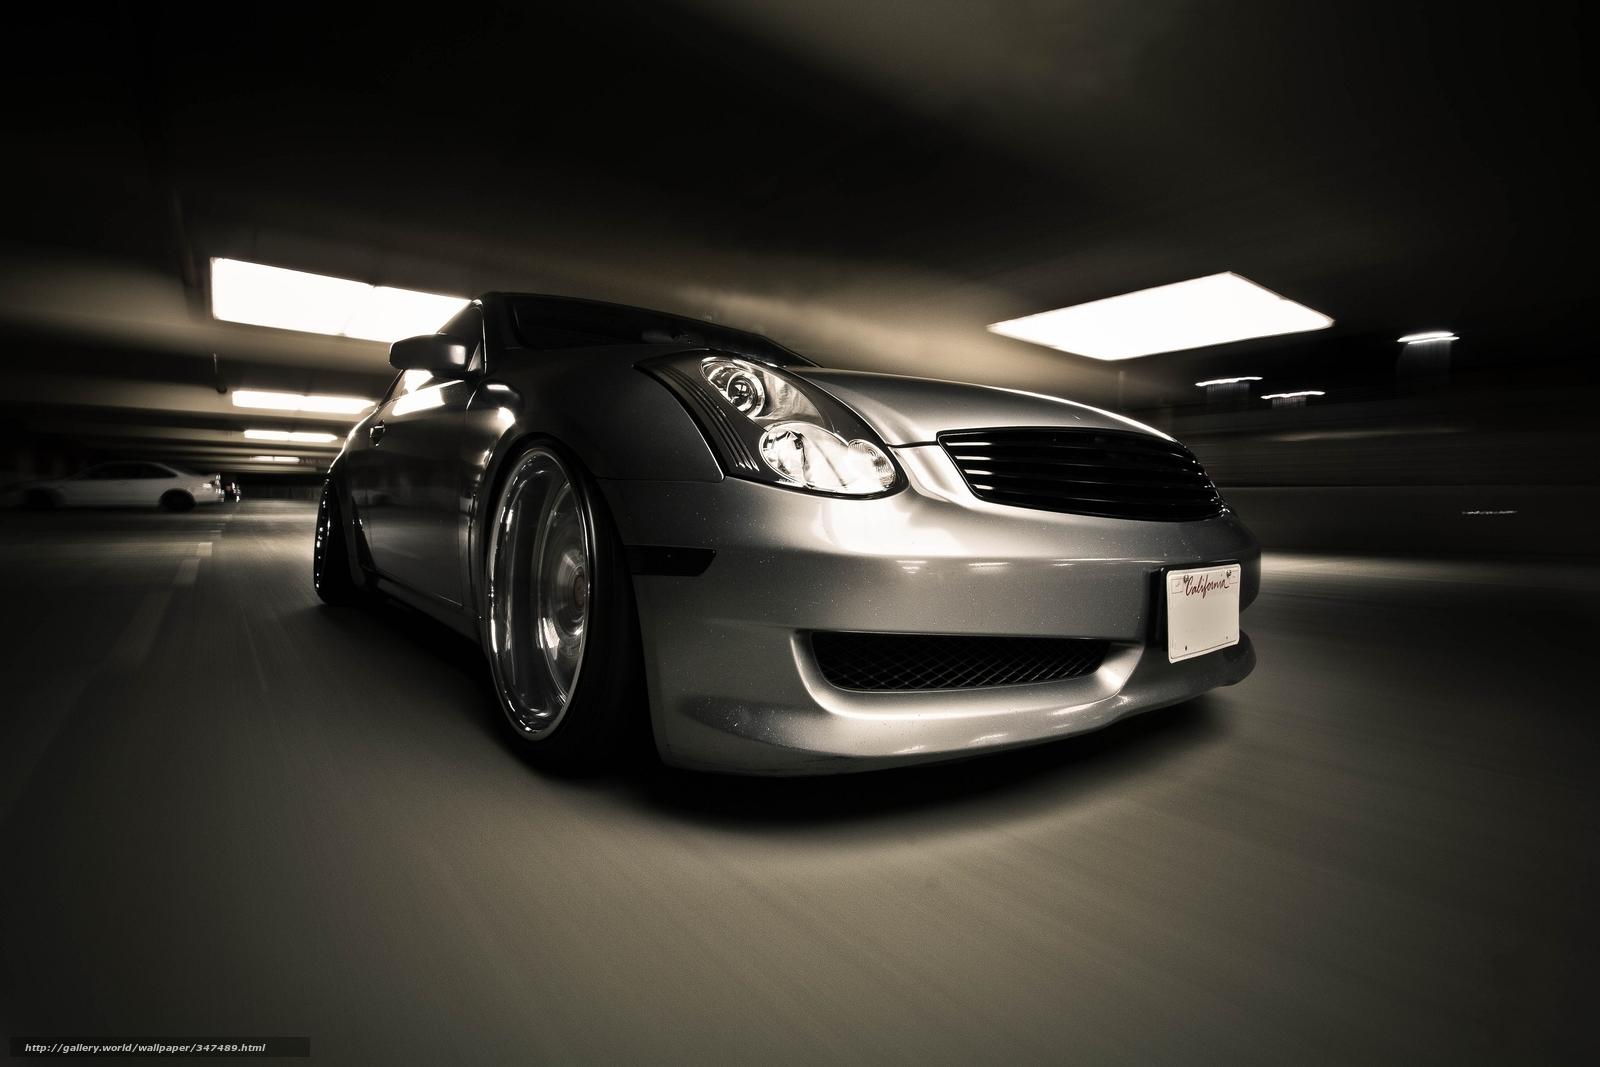 Download wallpaper Car rate motion photo free desktop wallpaper in